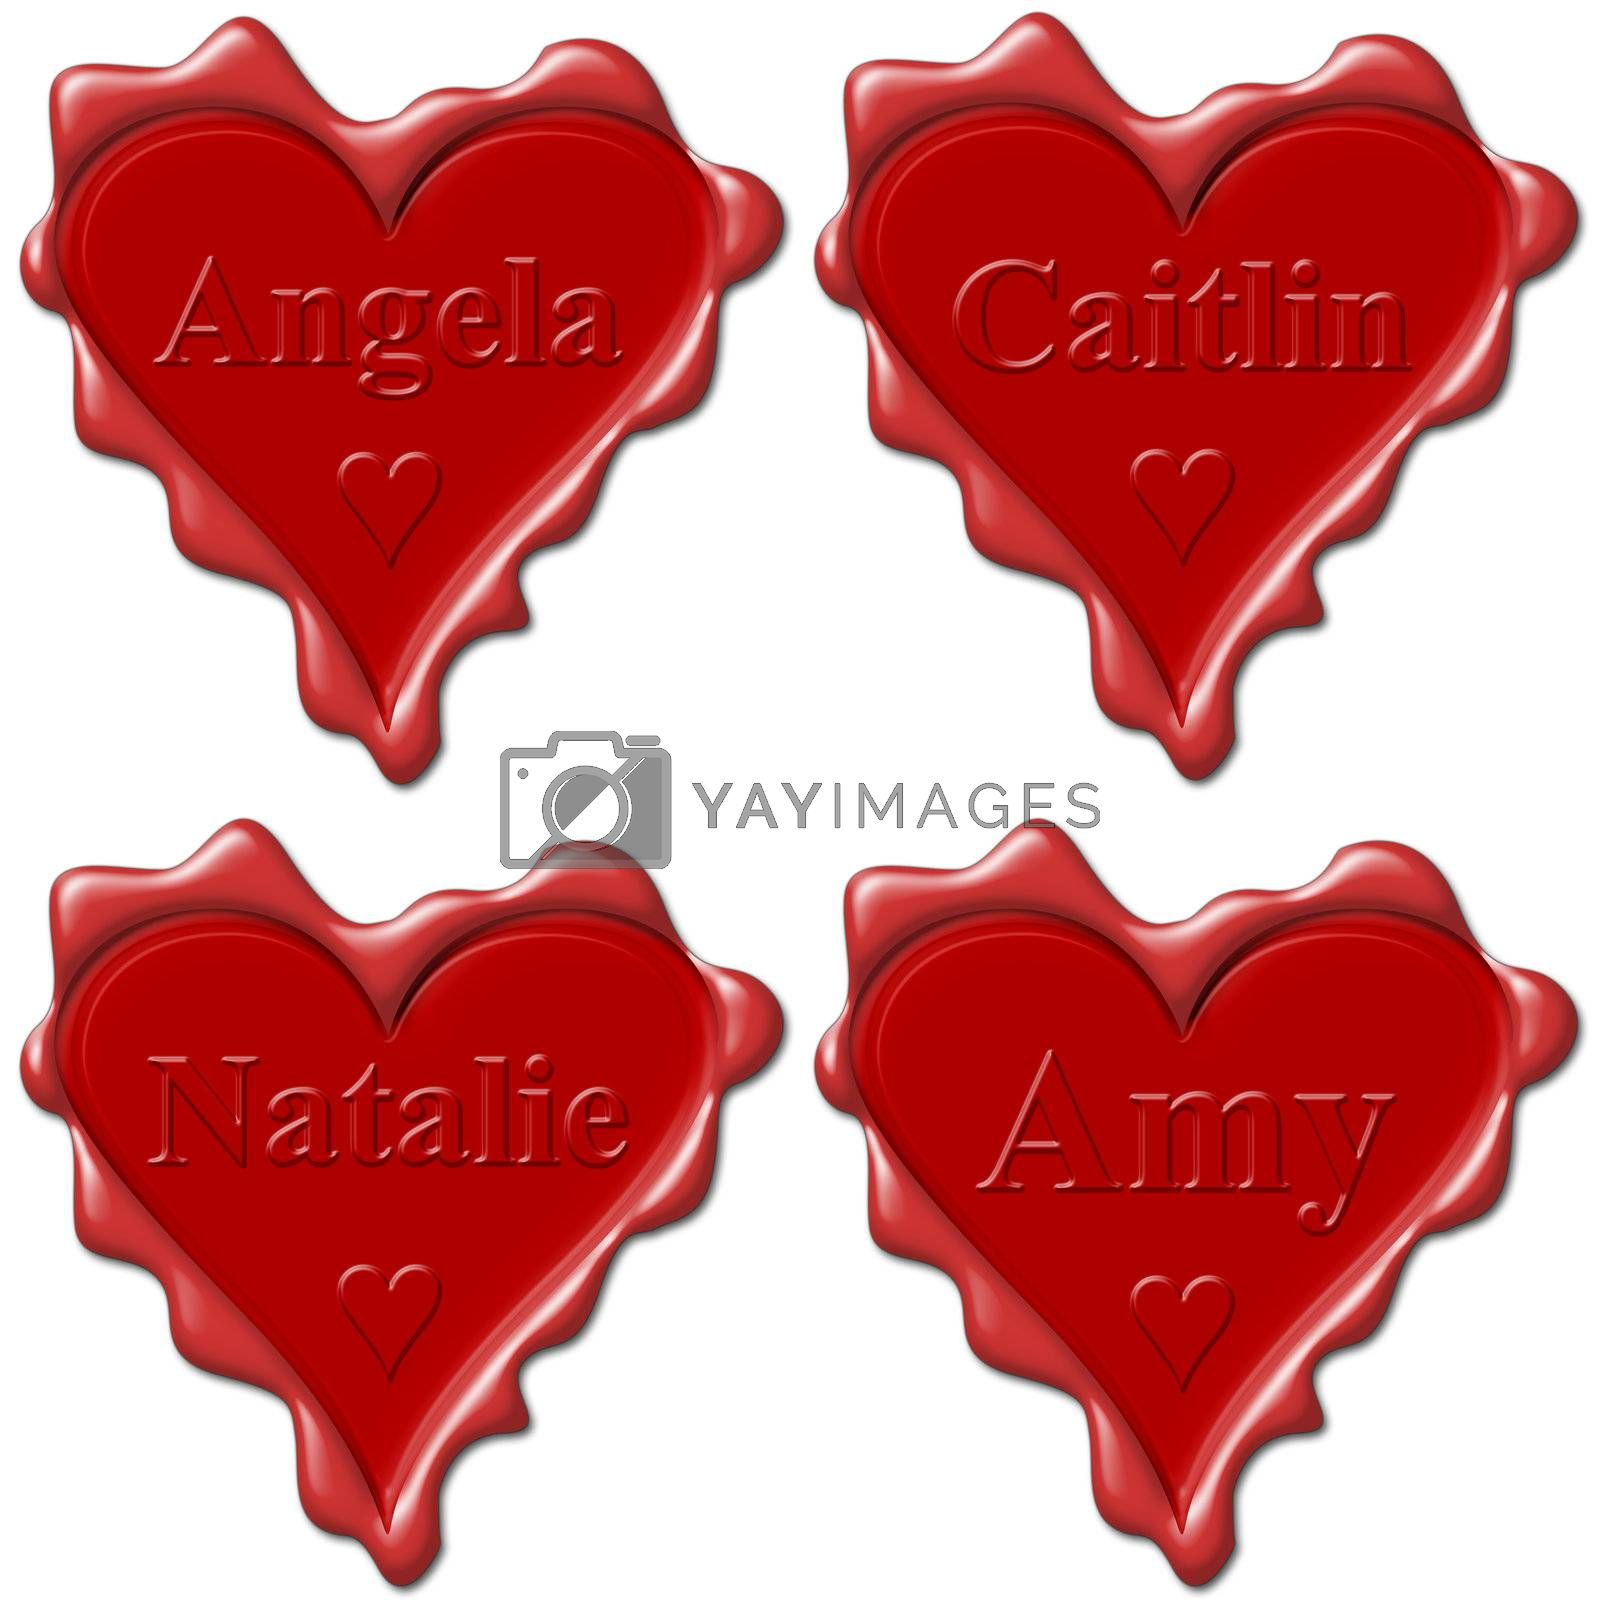 Valentine love hearts with names: Angela, Caitlin, Natalie, Amy